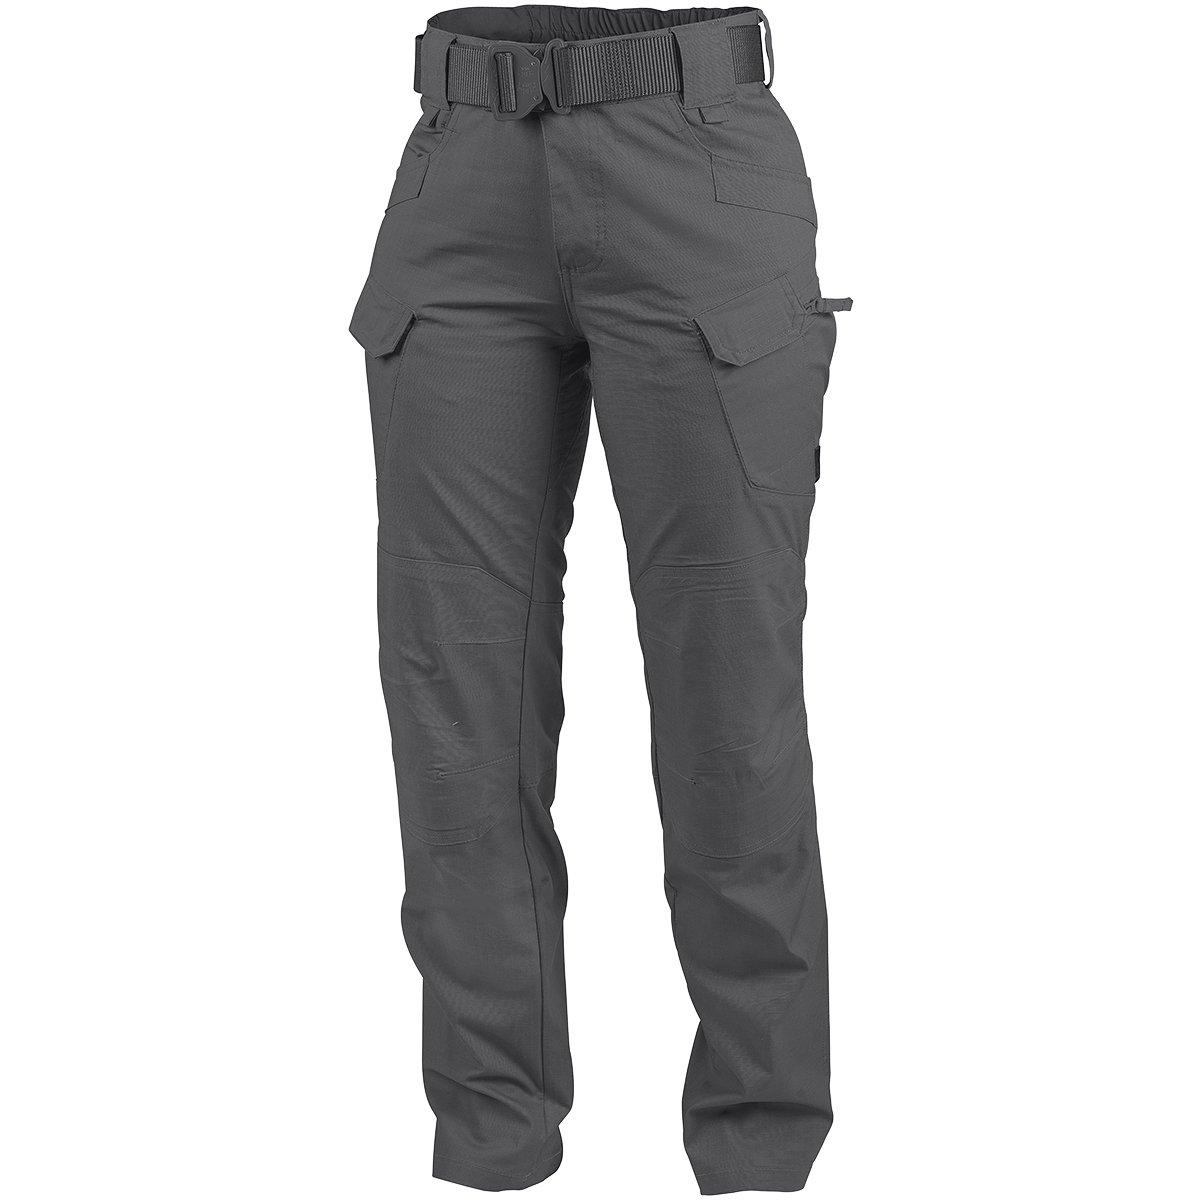 HELIKON-TEX Helikon Women's UTP Trousers Shadow Grey Polycotton Ripstop Size 32/34